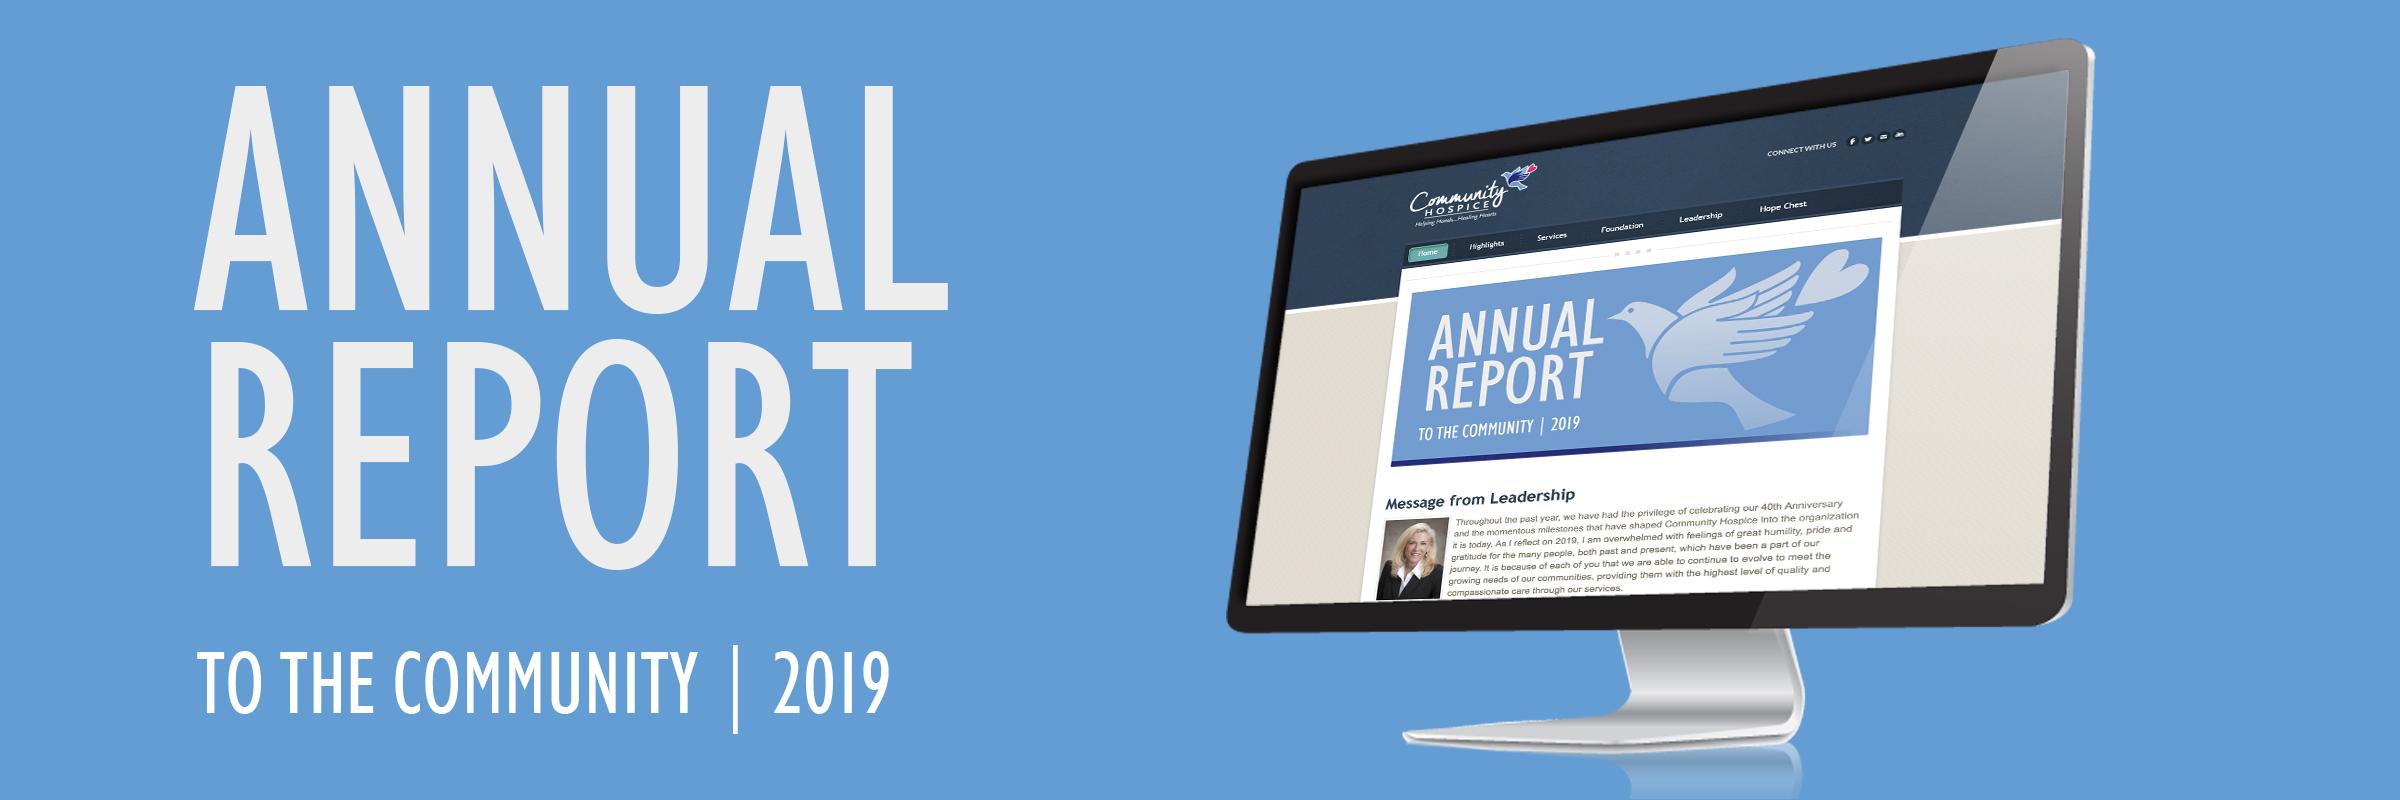 Annual Report_2